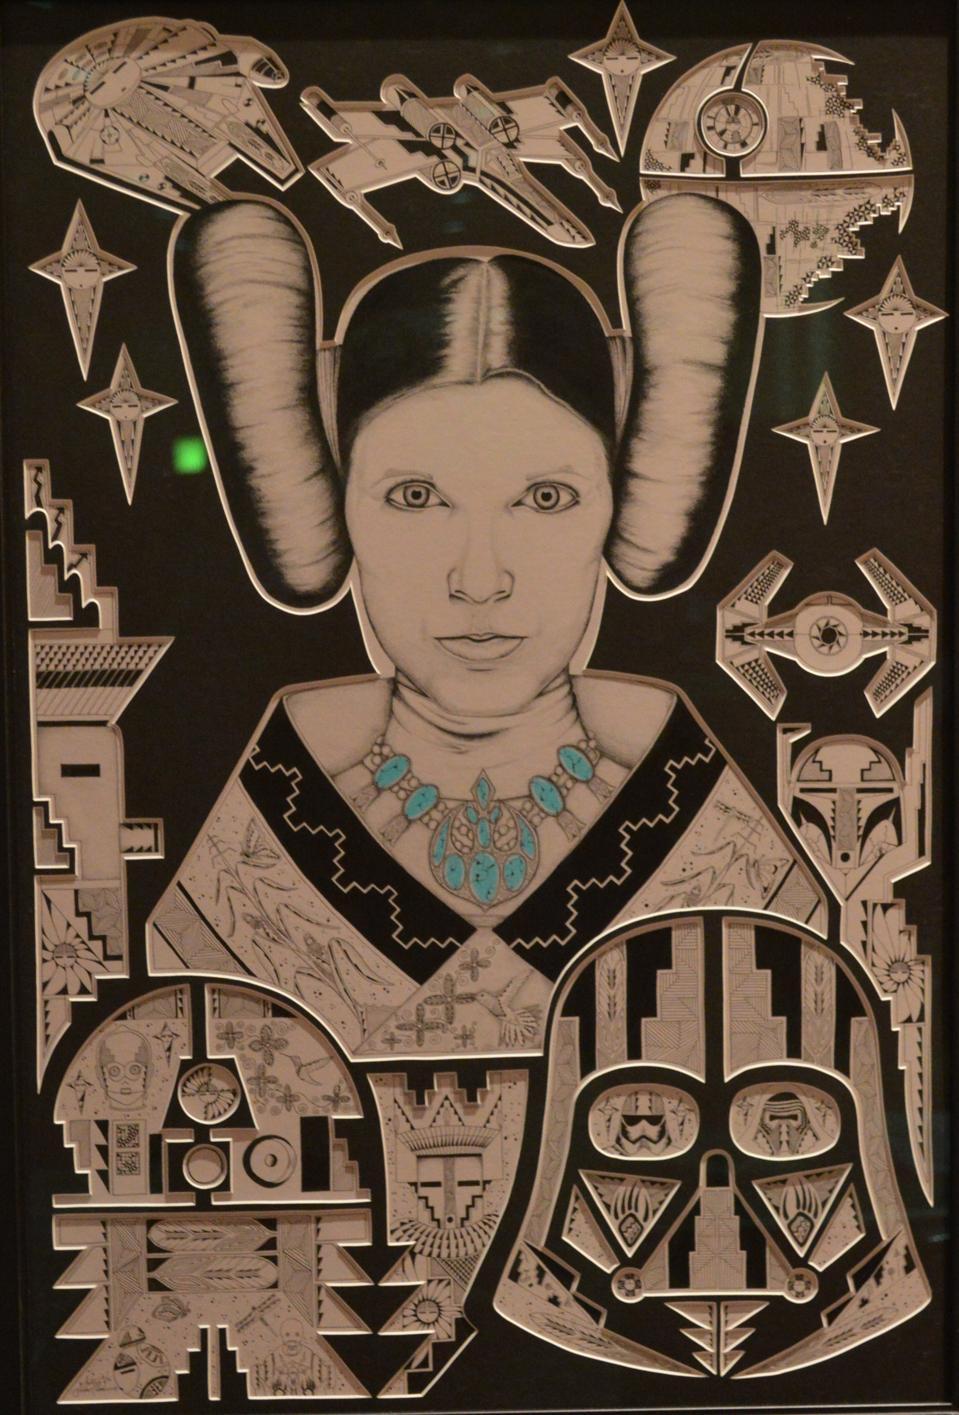 Mike Toya (Jemez Pueblo), Maiden Leia, 2017. Fine art print on paper.